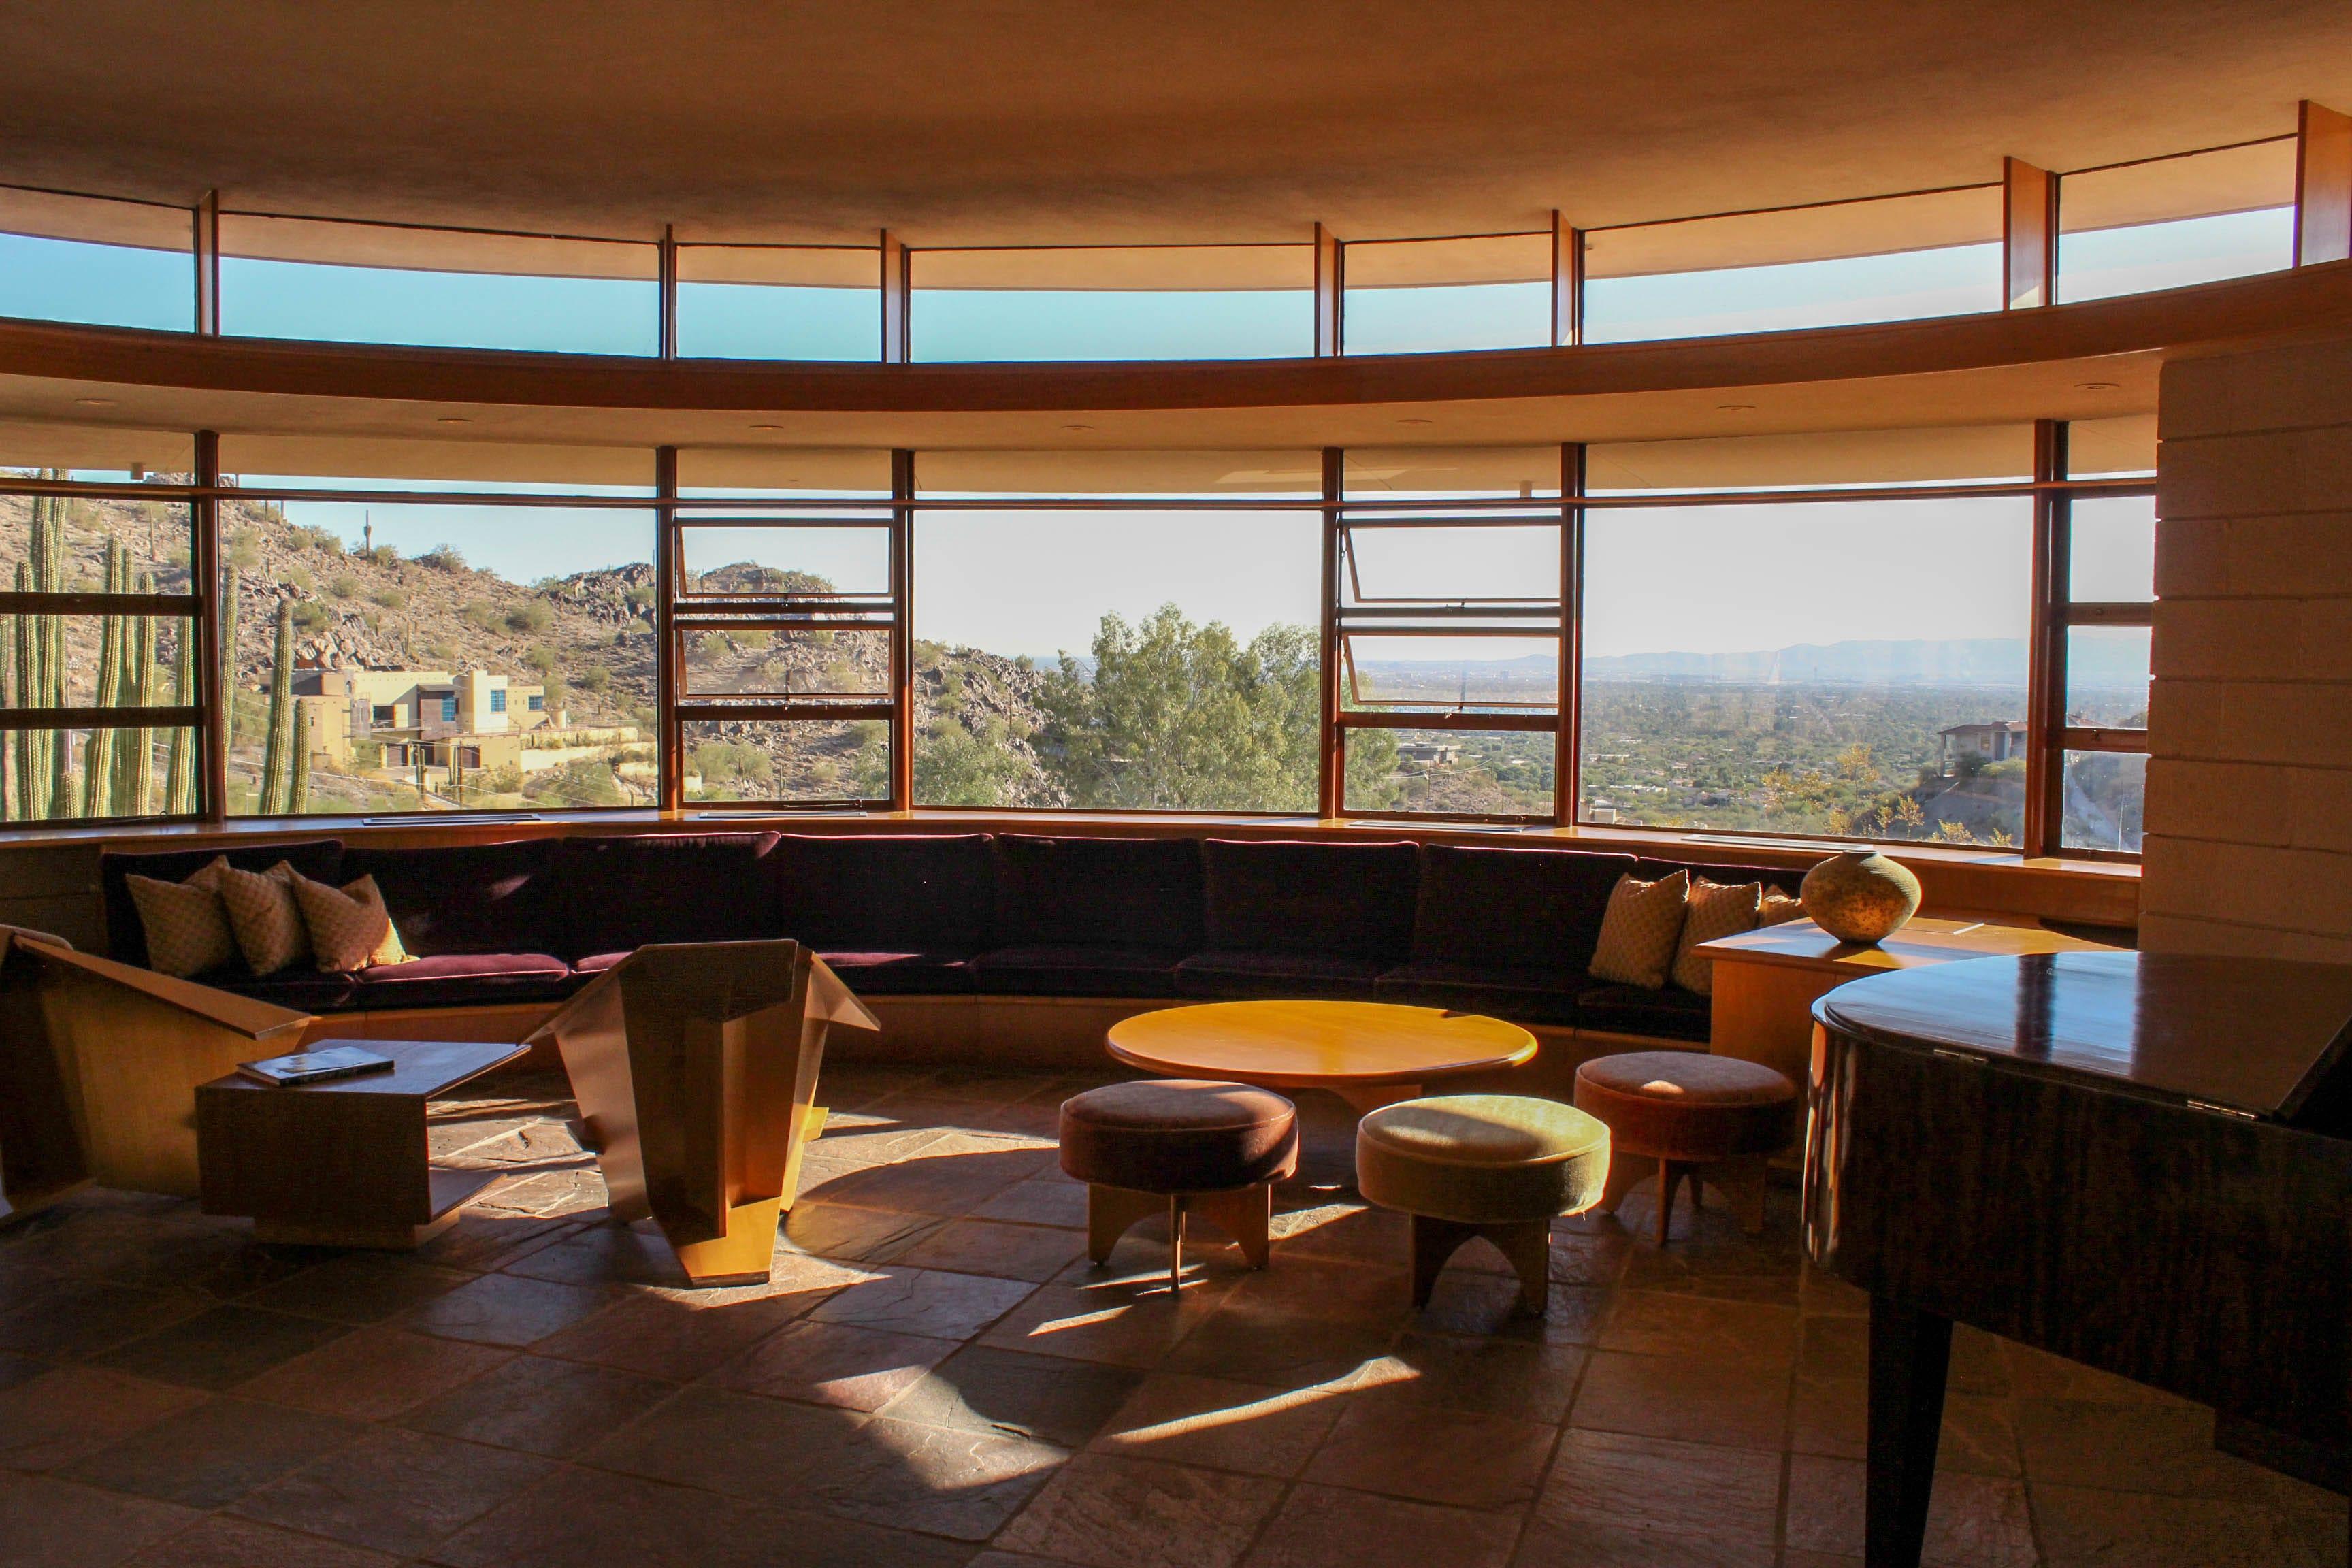 Frank Lloyd Wright Interior Design King5  The Last House Frank Lloyd Wright Ever Designed Up For